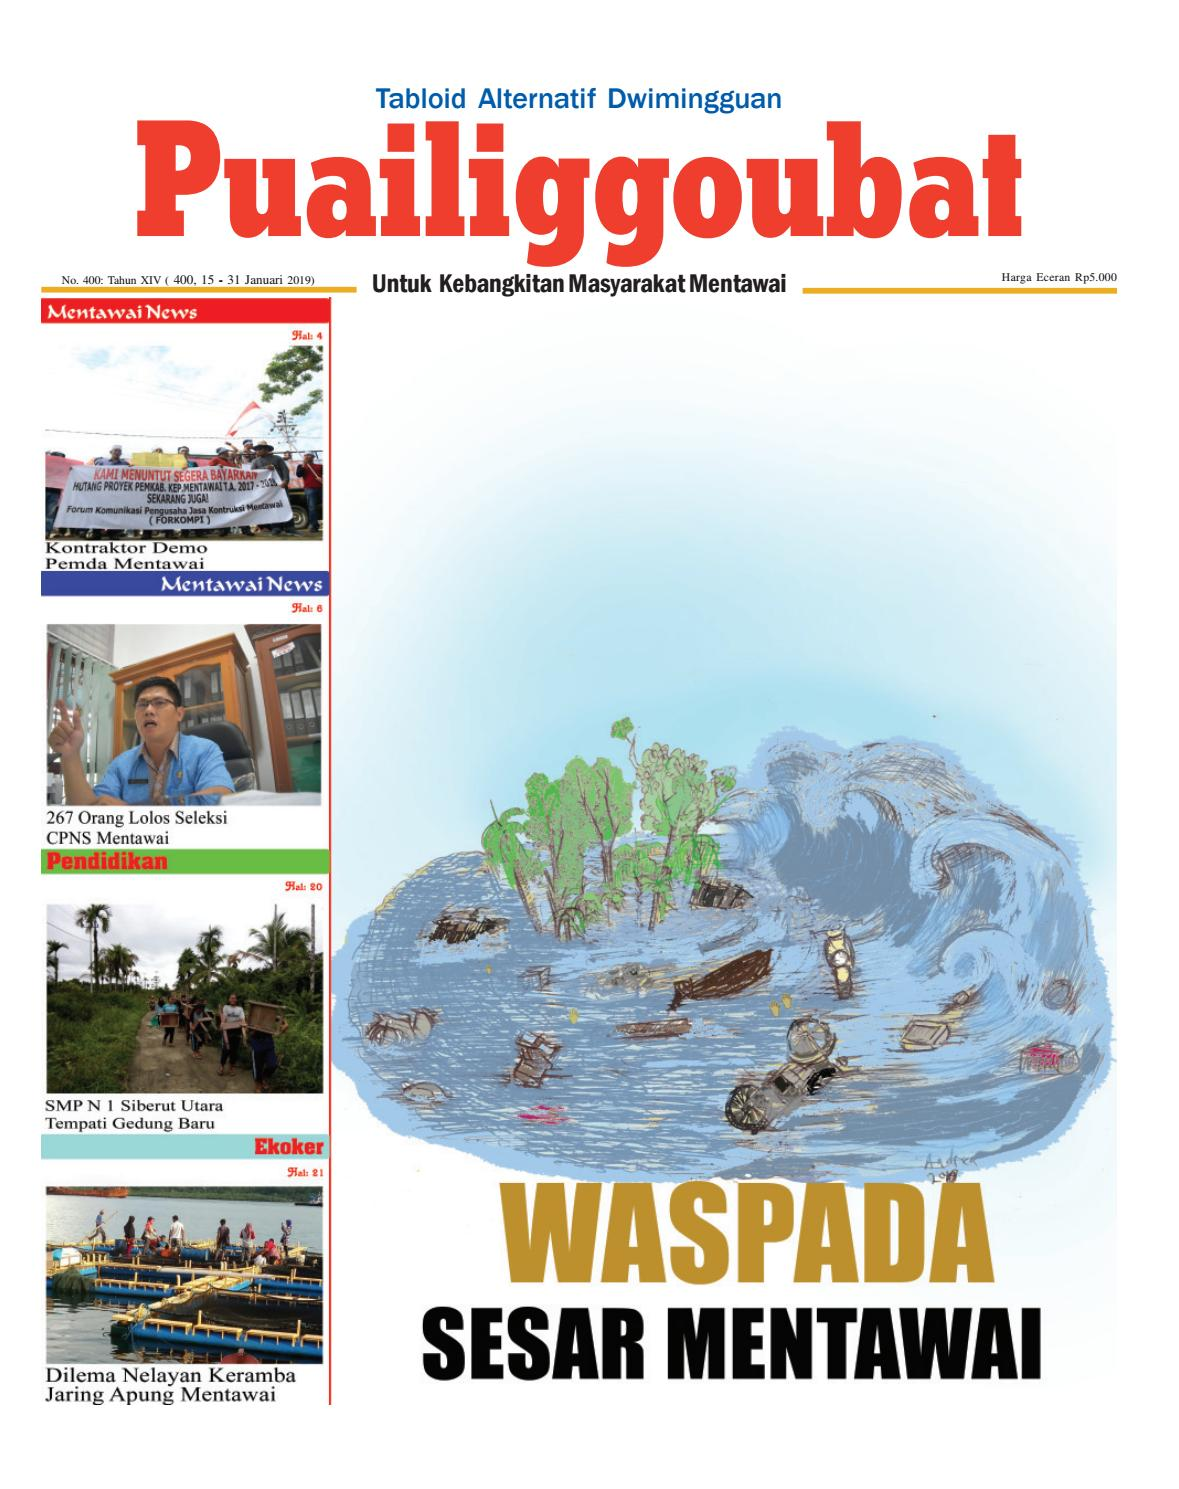 Puailiggoubat NO 400 15 31 Januari 2019 by Redaksi